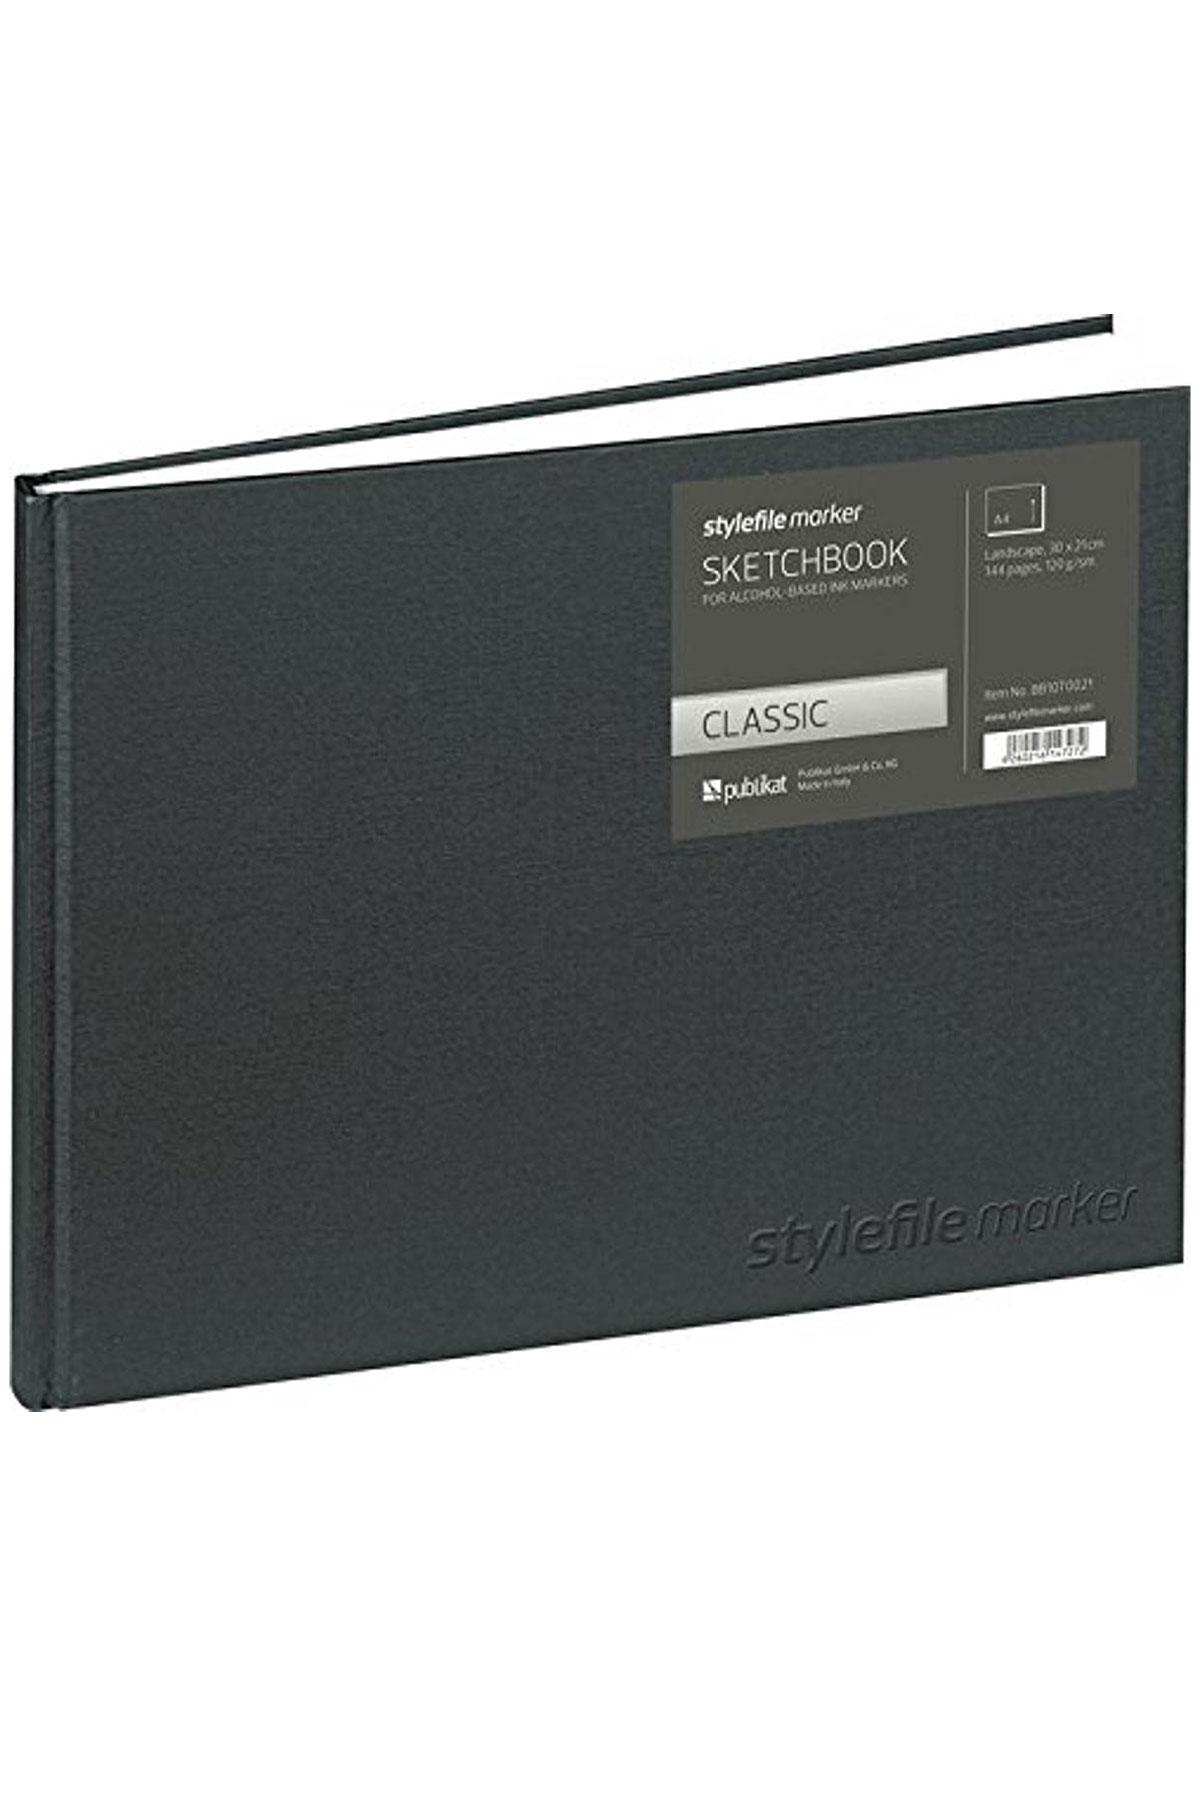 Stylefile Marker Classic Sketchbook - LANDSCAPE A4